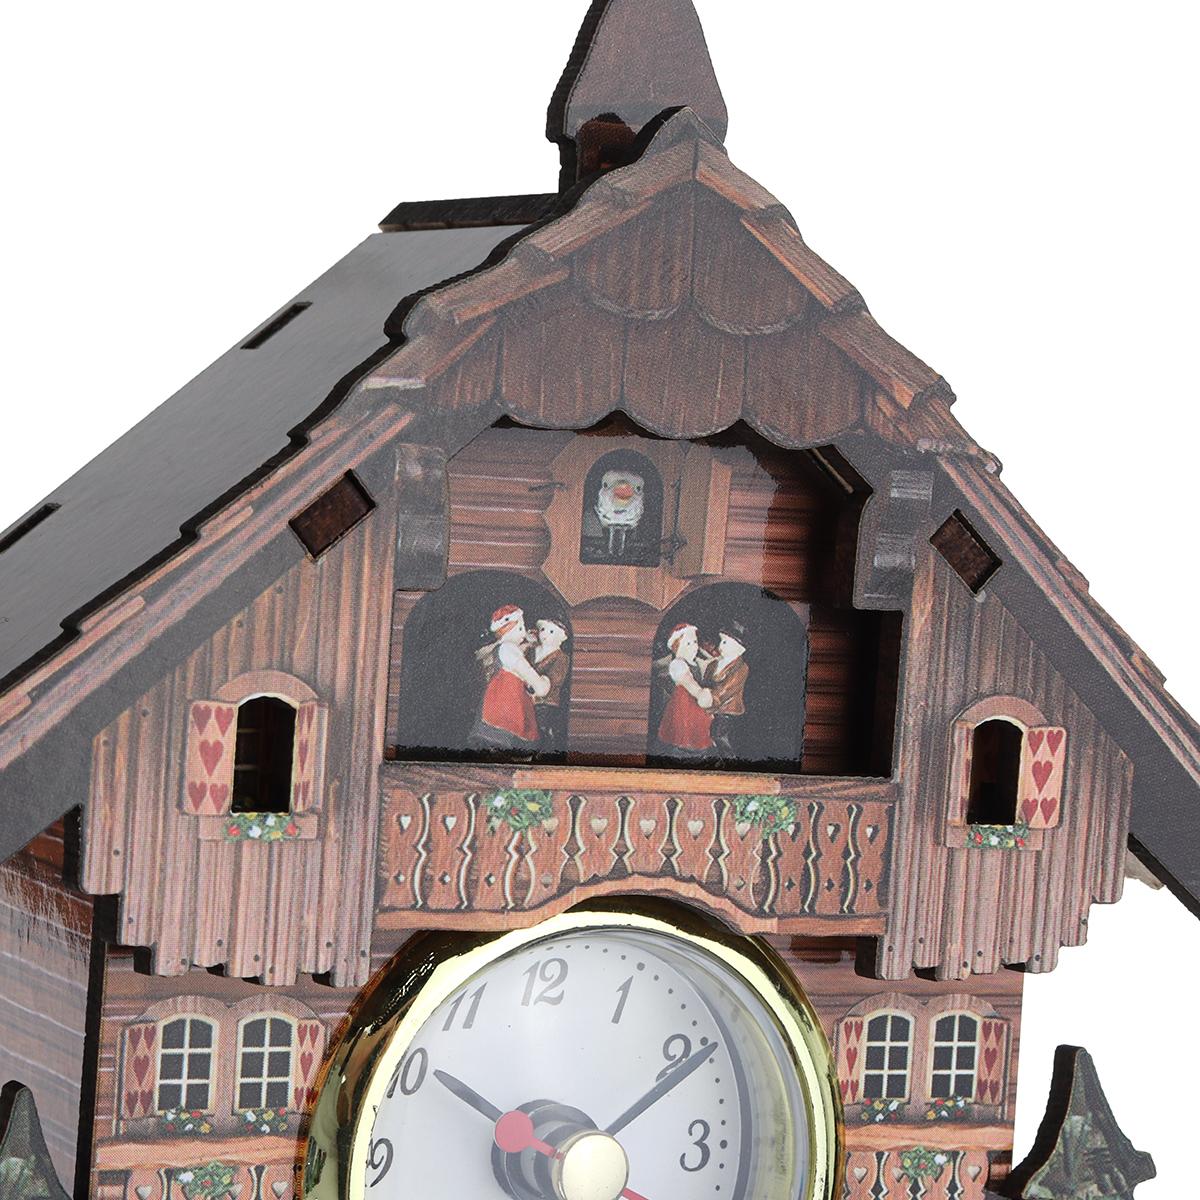 Home Decorat: Cuckoo Clock Mount Wooden Wall Clock Analog Auto